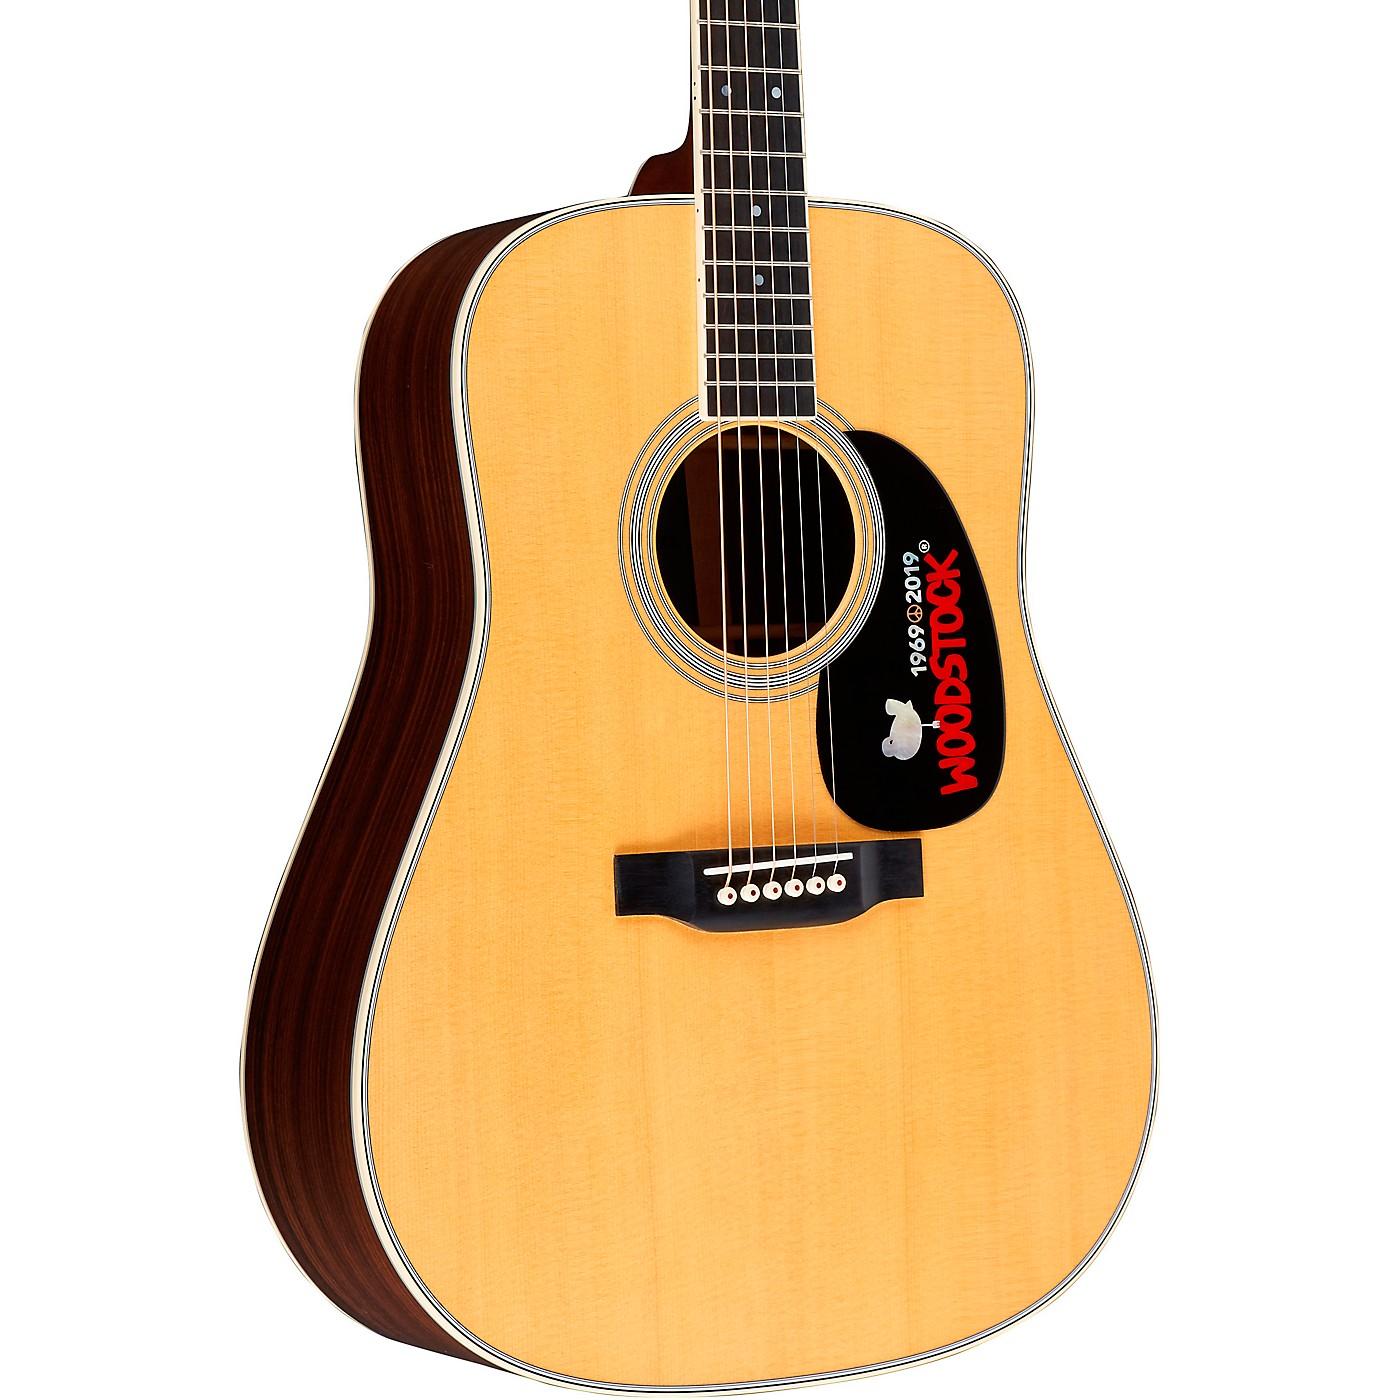 Martin D-35 Woodstock 50th Anniversary Deadnought Acoustic Guitar thumbnail